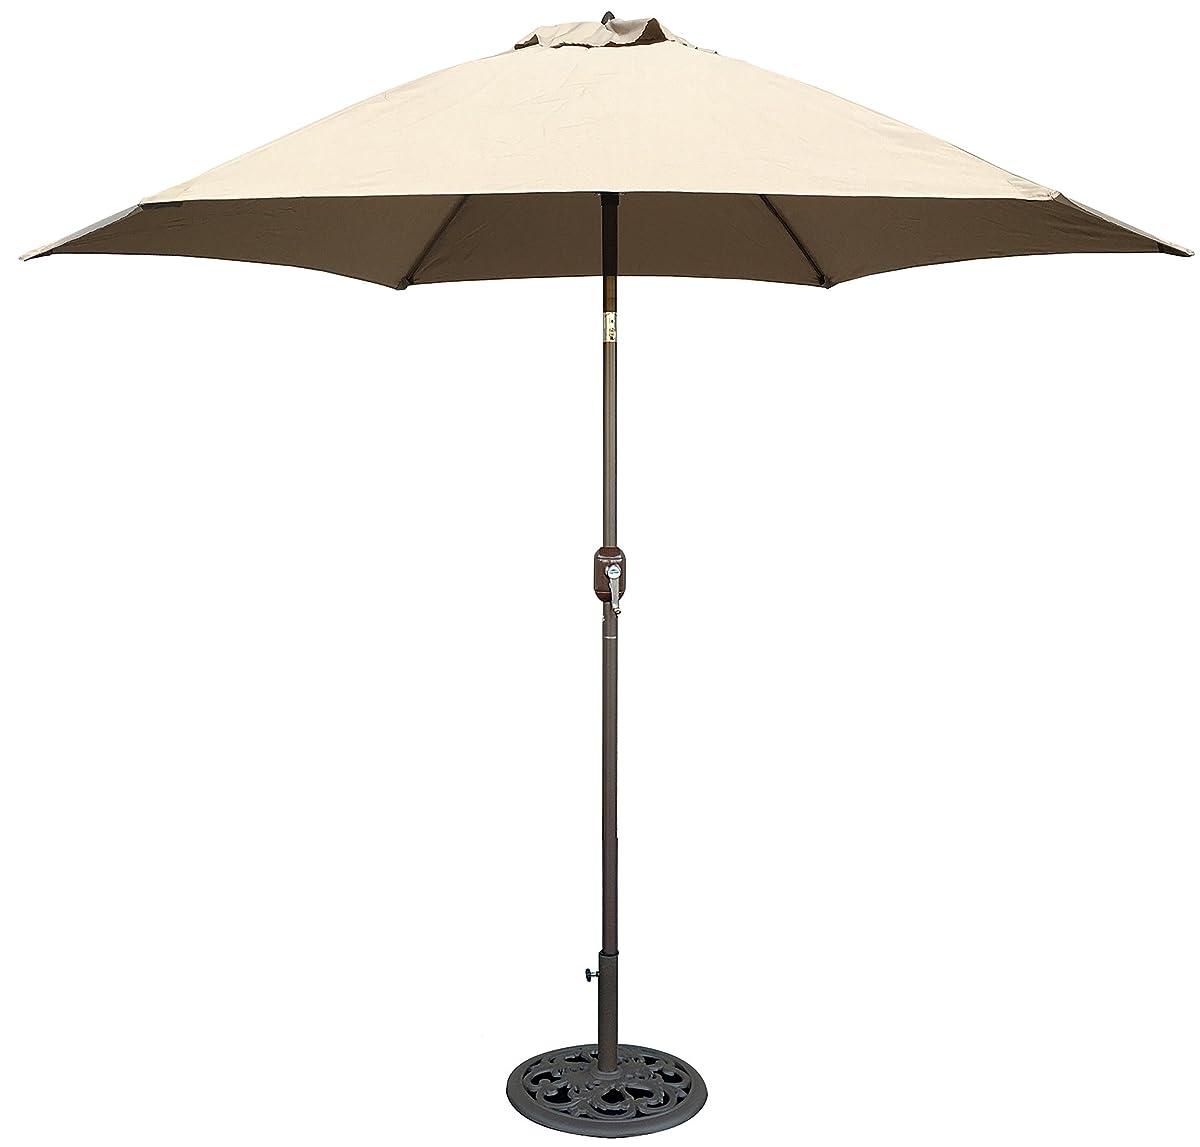 TropiShade 9 ft Bronze Aluminum Patio Umbrella with Beige Polyester Cover